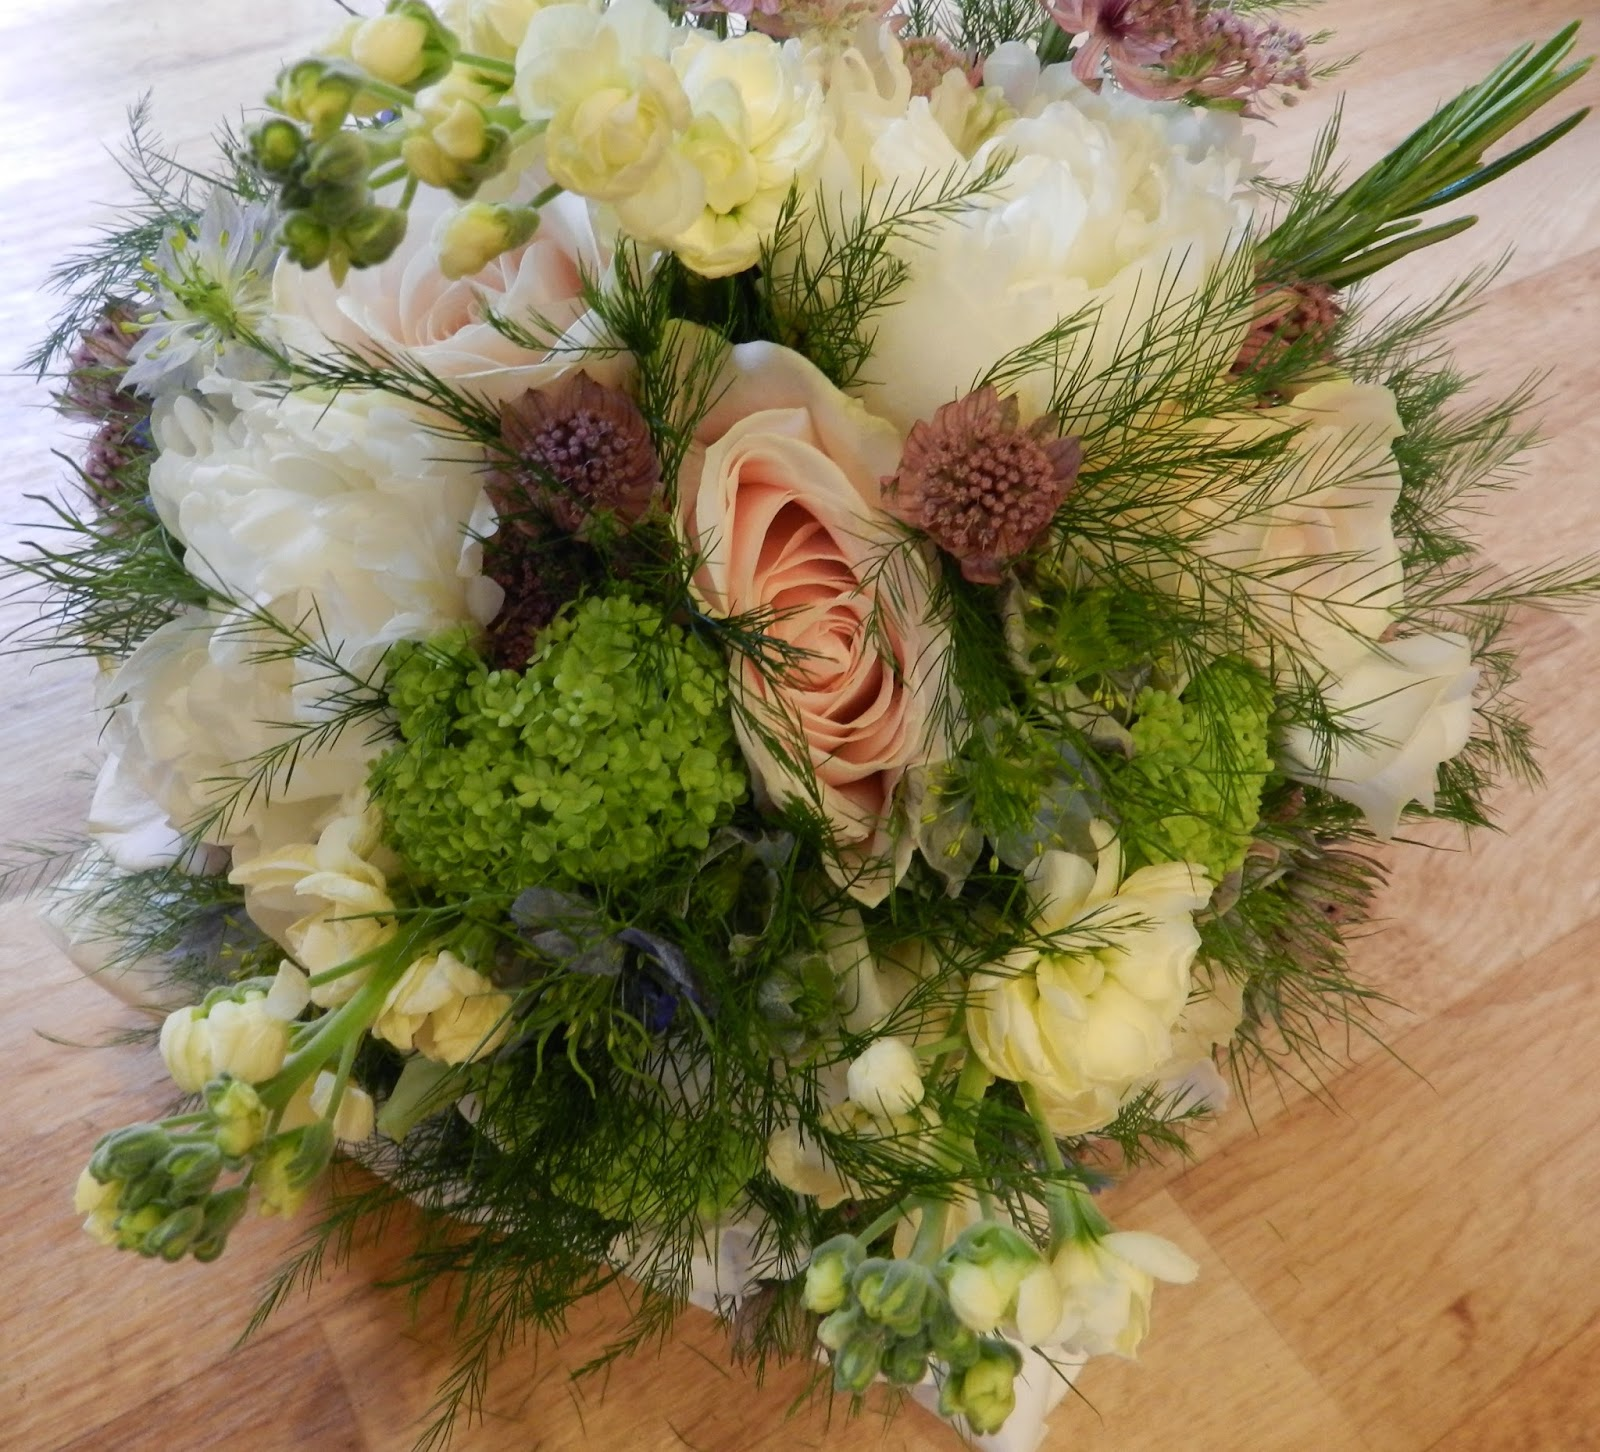 Wedding Flowers For Summer: Sandra's Flower Studio: Vintage Summer Wedding Flowers